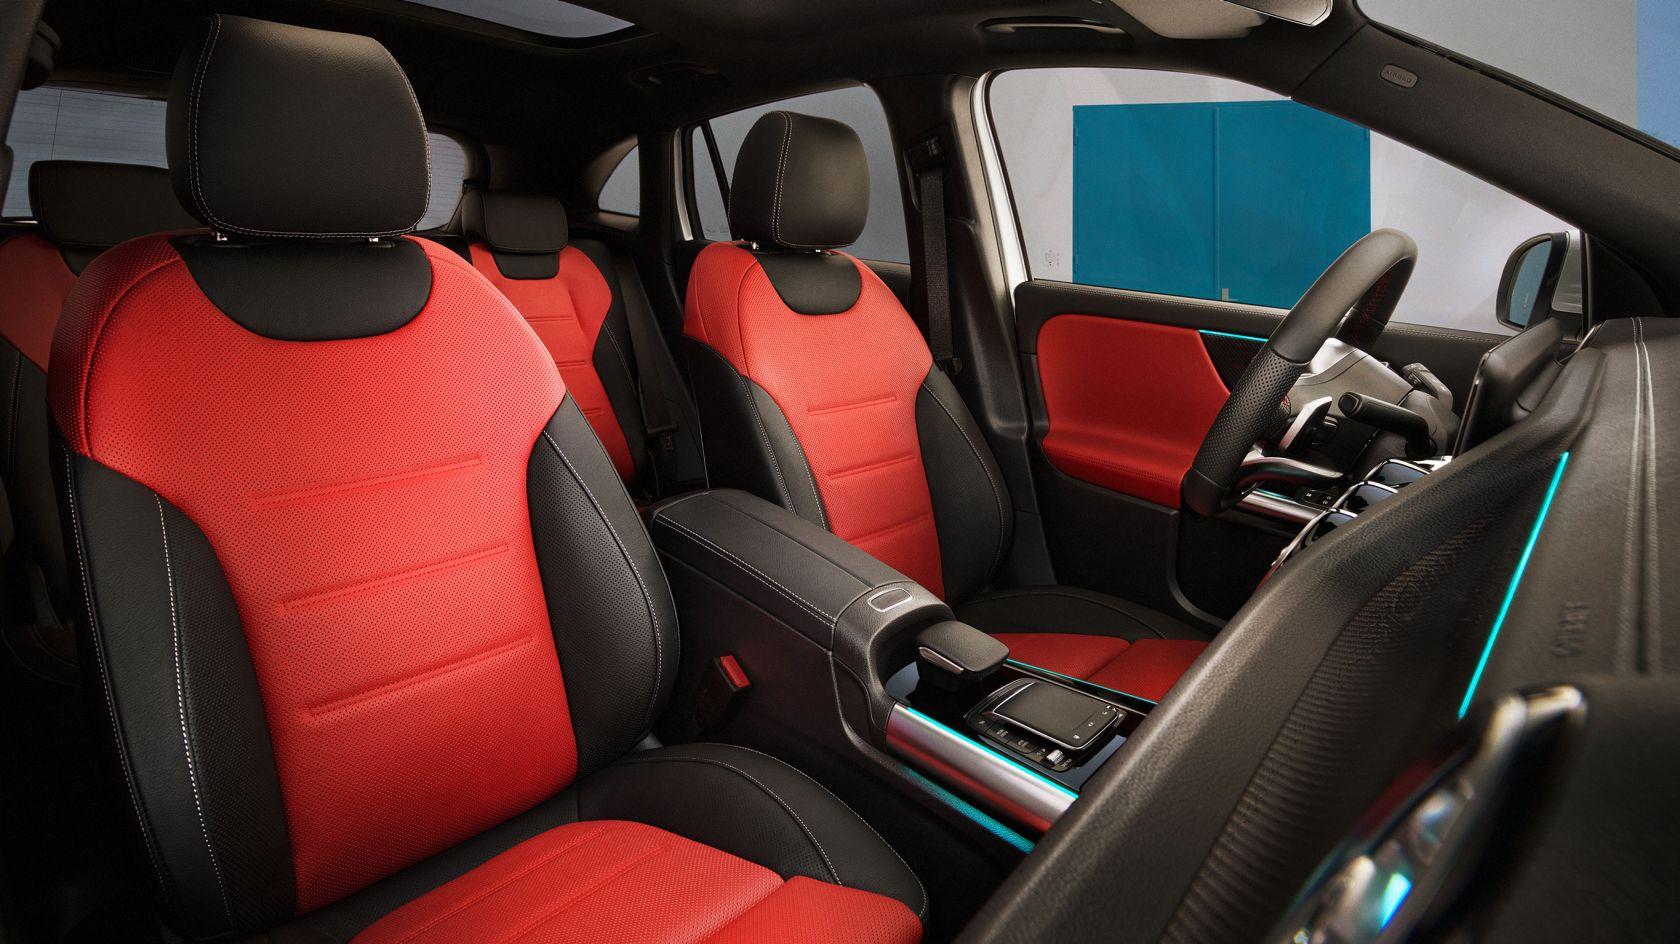 CAR-Avenue-Mercedes-Benz-GLA-SUV-03